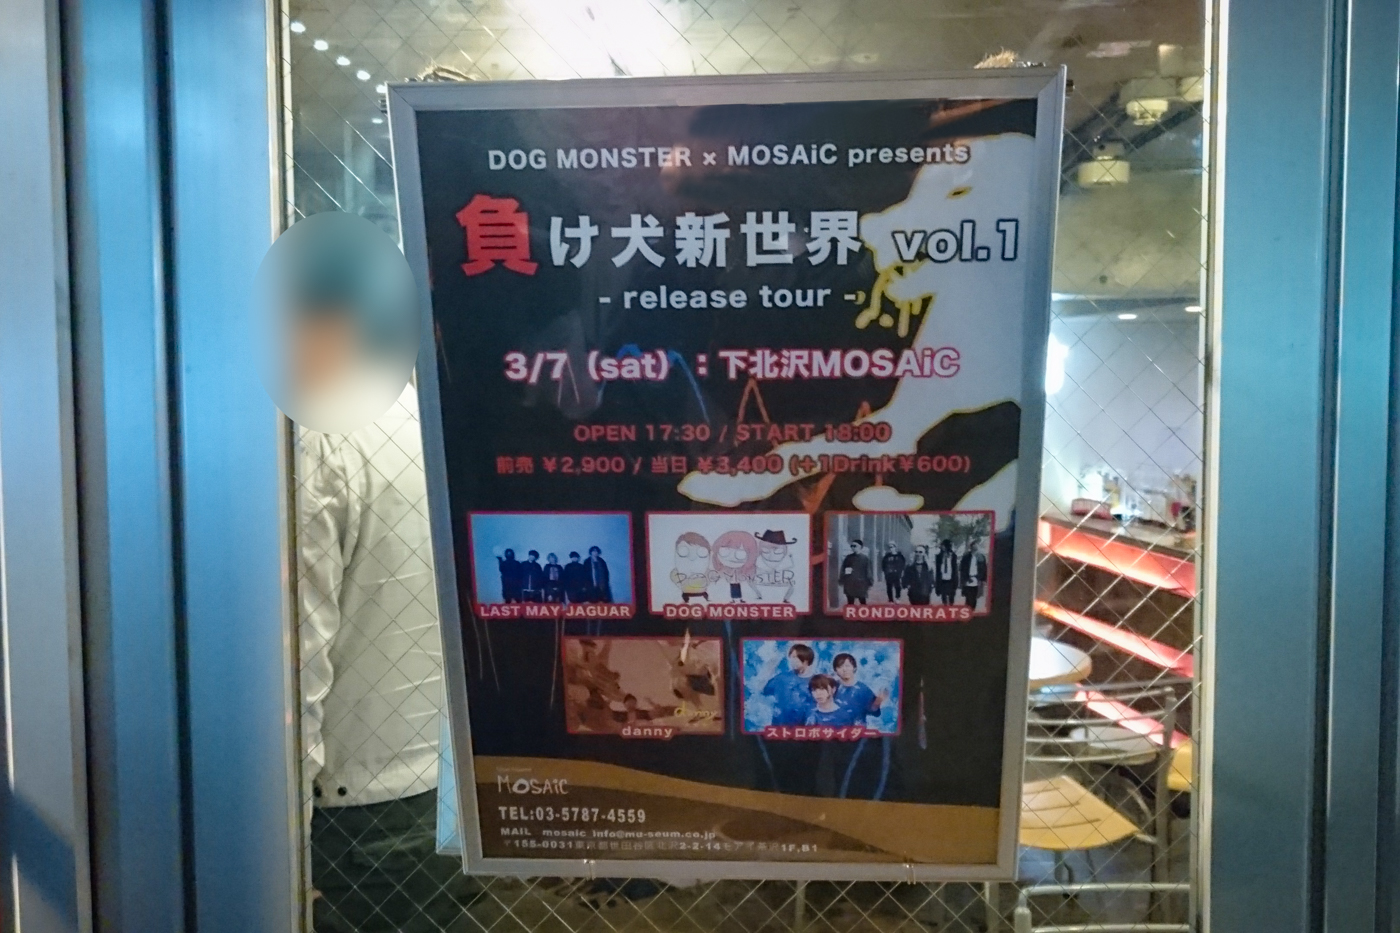 DOG MONSTER × MOSAiC presents 限定CD〝負け犬新世界vol.1 ″release tour 東京編@下北沢MOSAiC